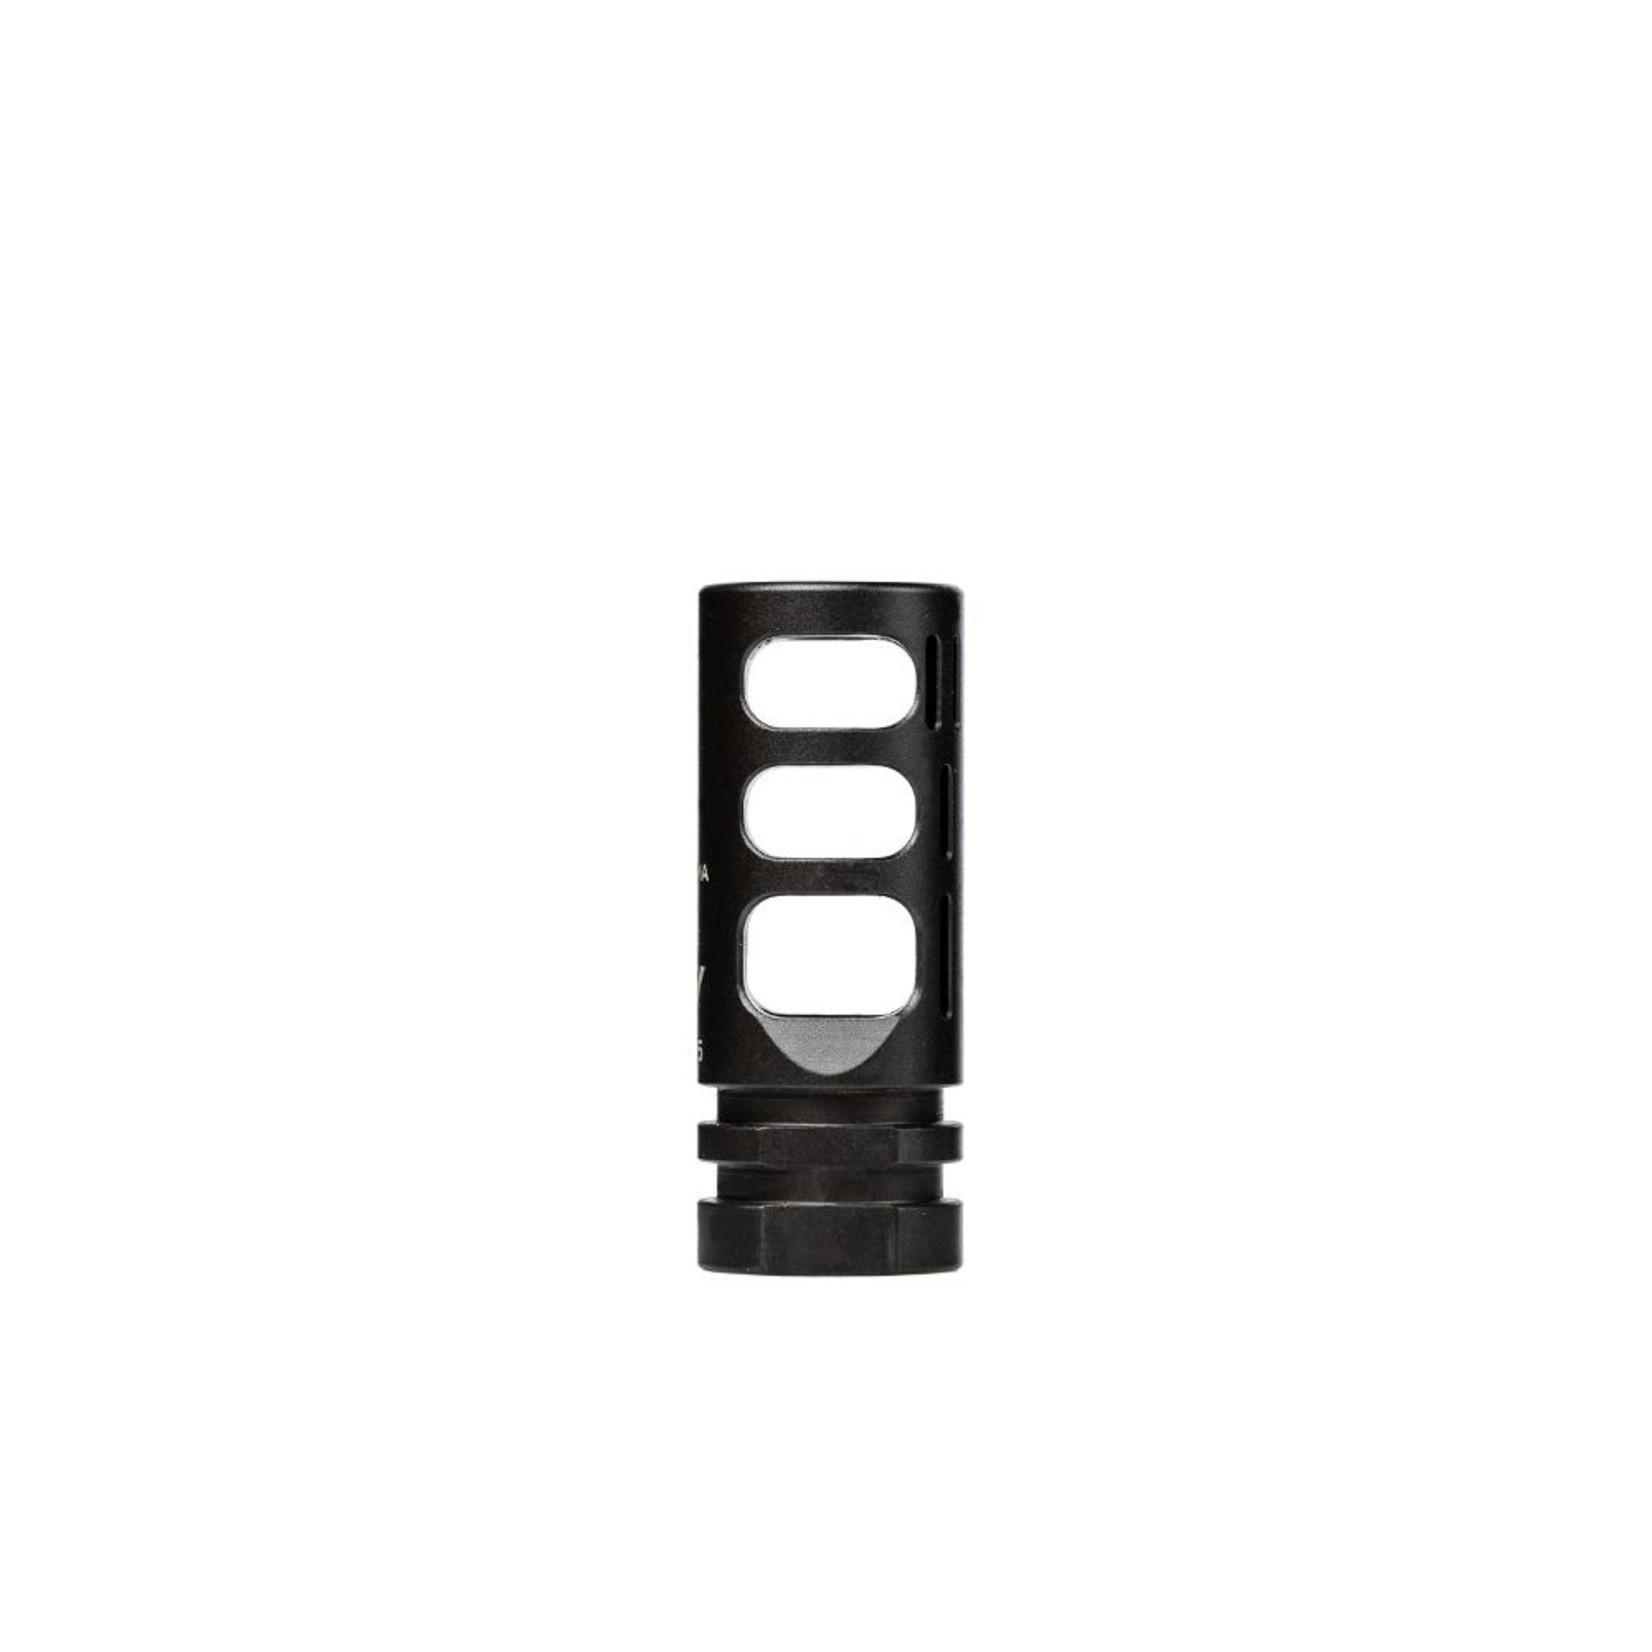 VG6 VG6 Gamma Muzzle Break, Black, Gamma 65